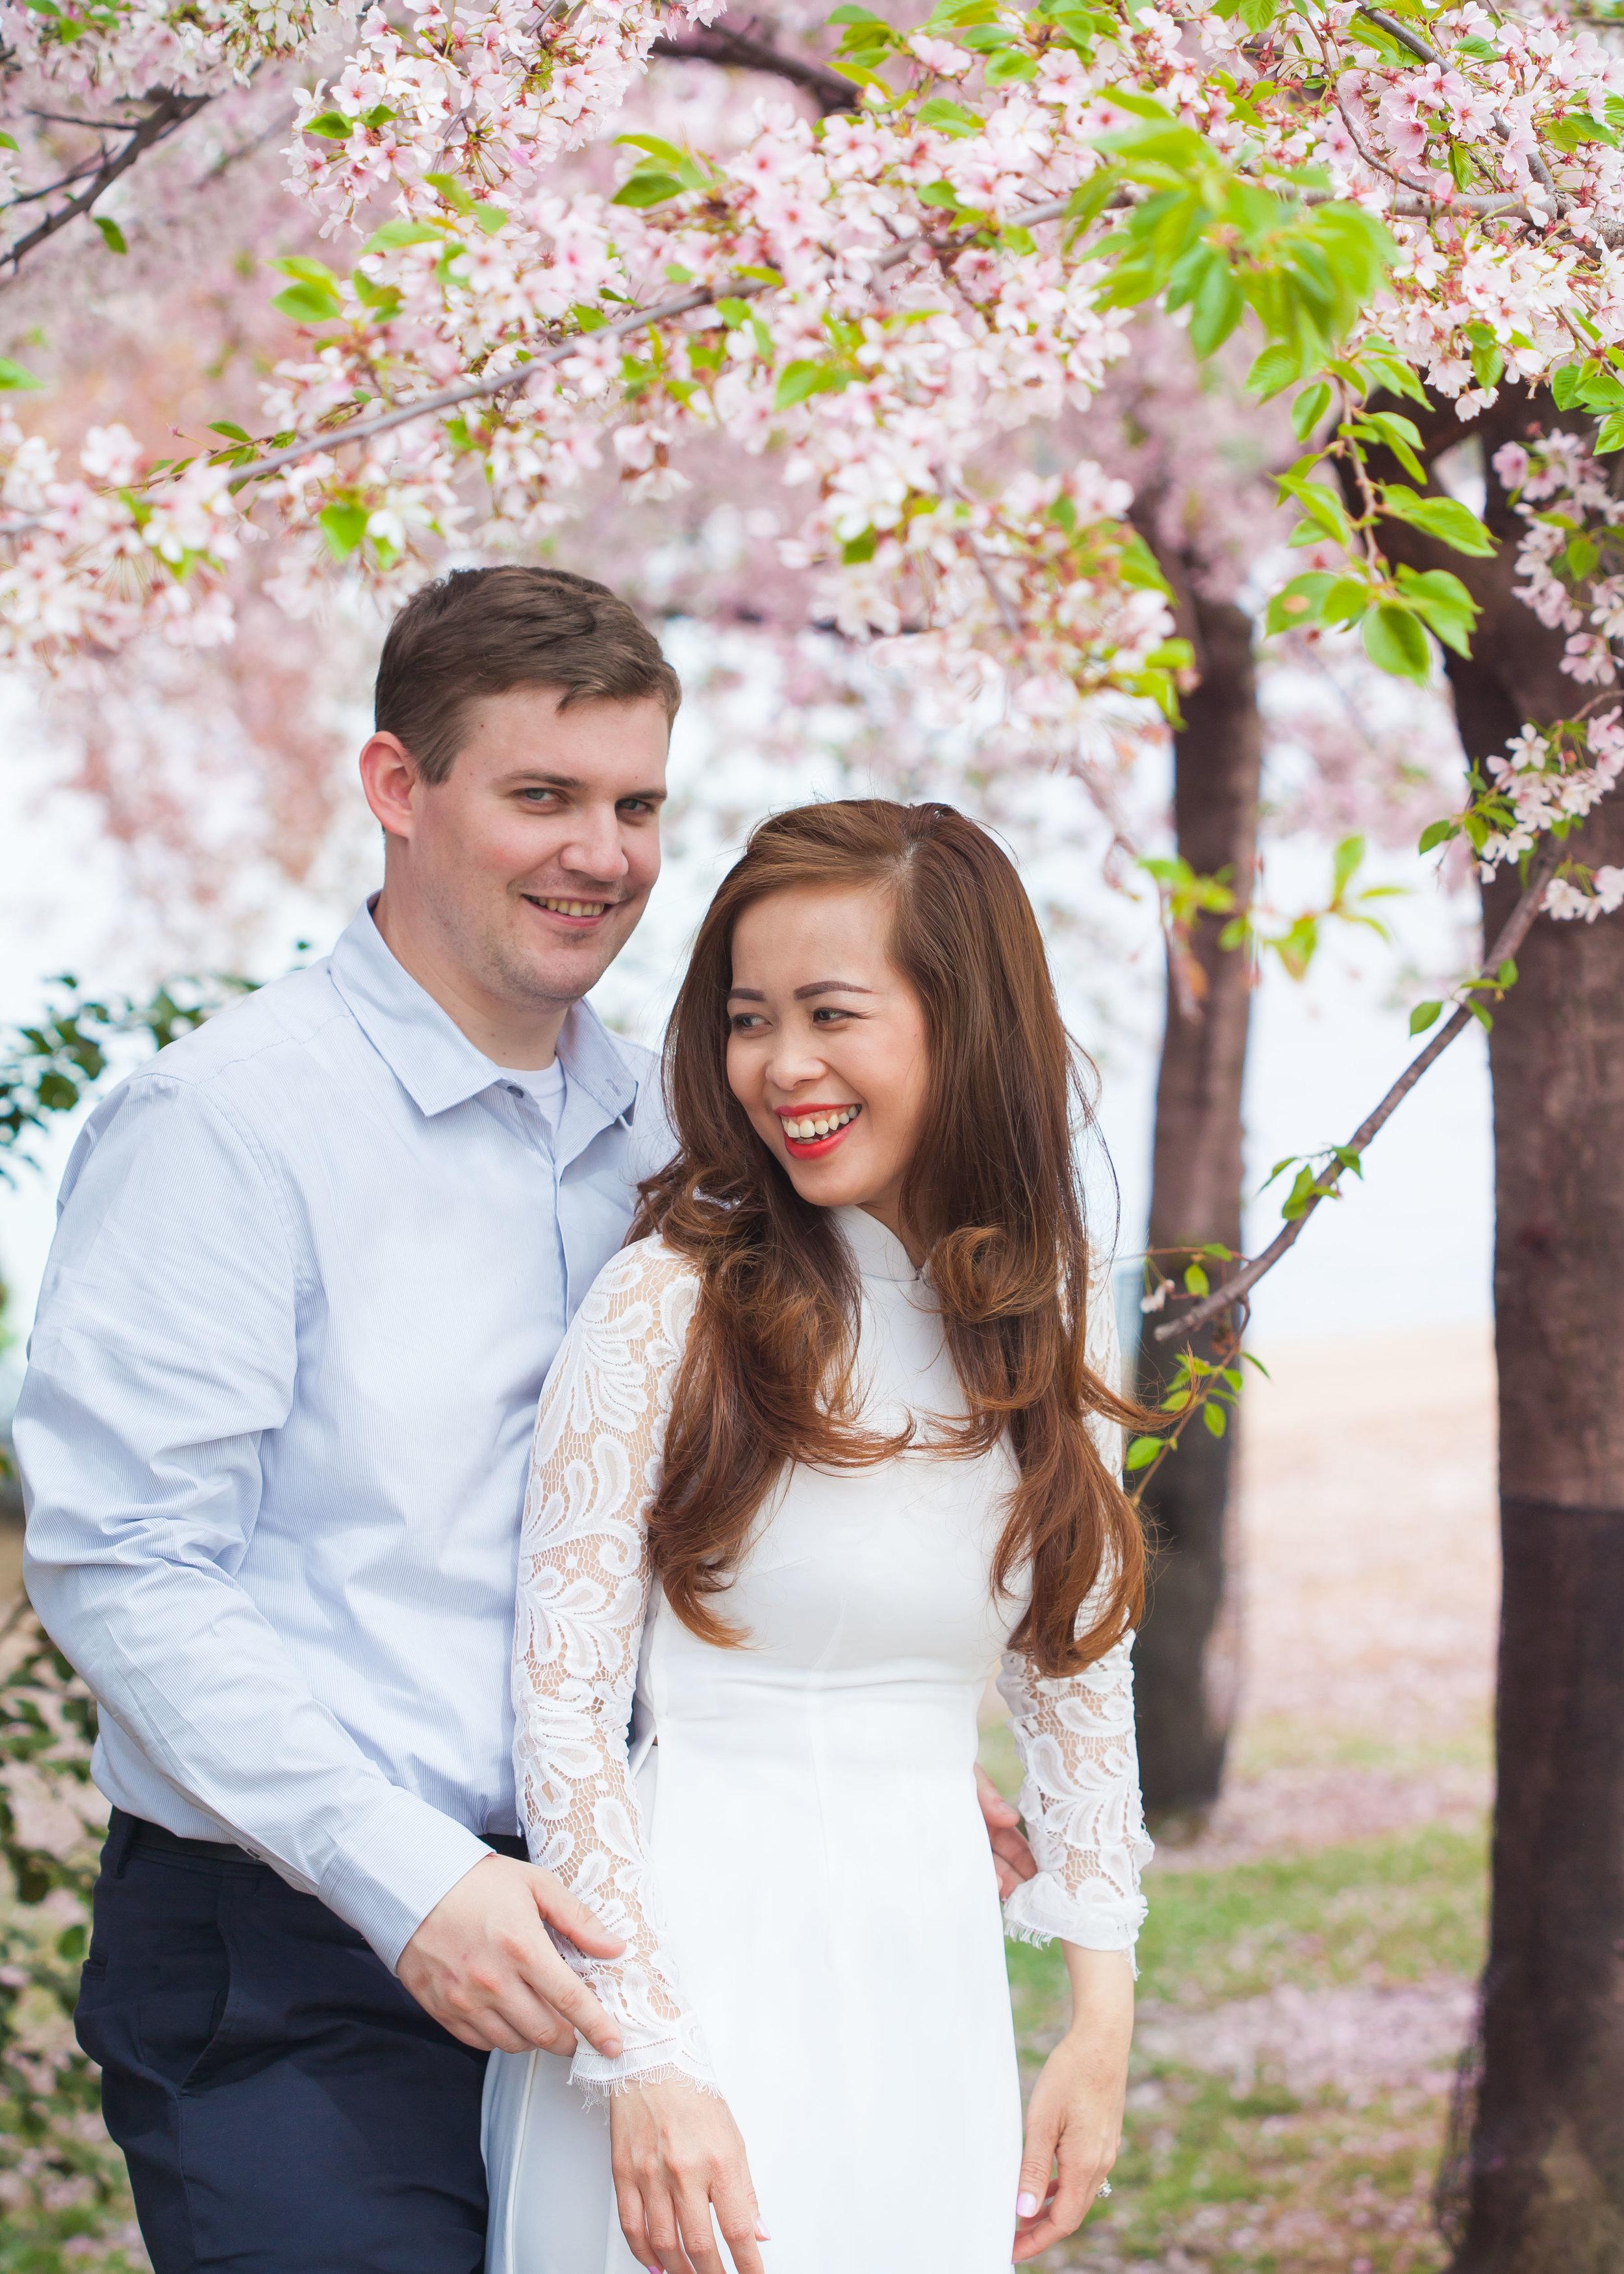 Steve & Ruby Cherry Blossom Portraits - 007.jpg